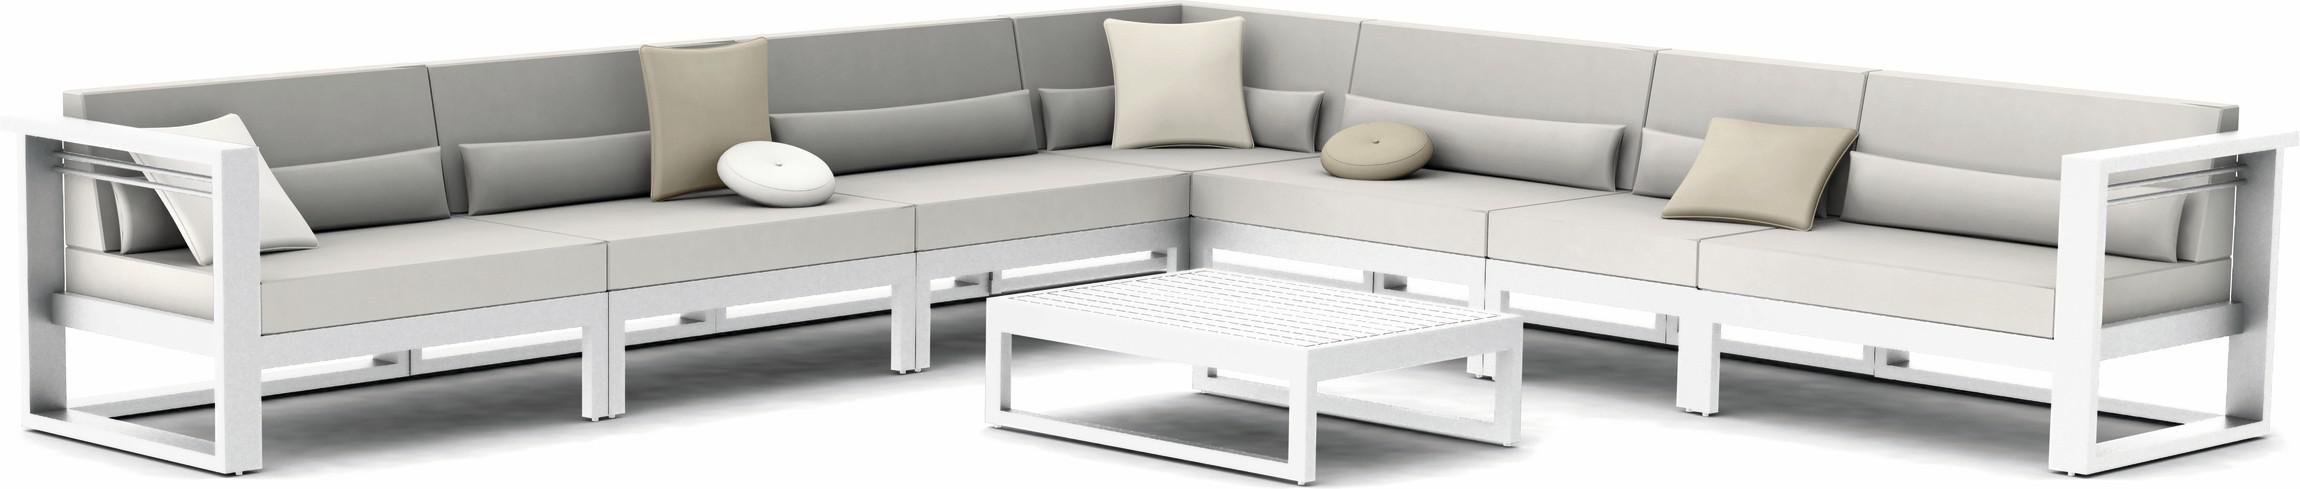 Fuse Concept 2 - bianco - textiles white